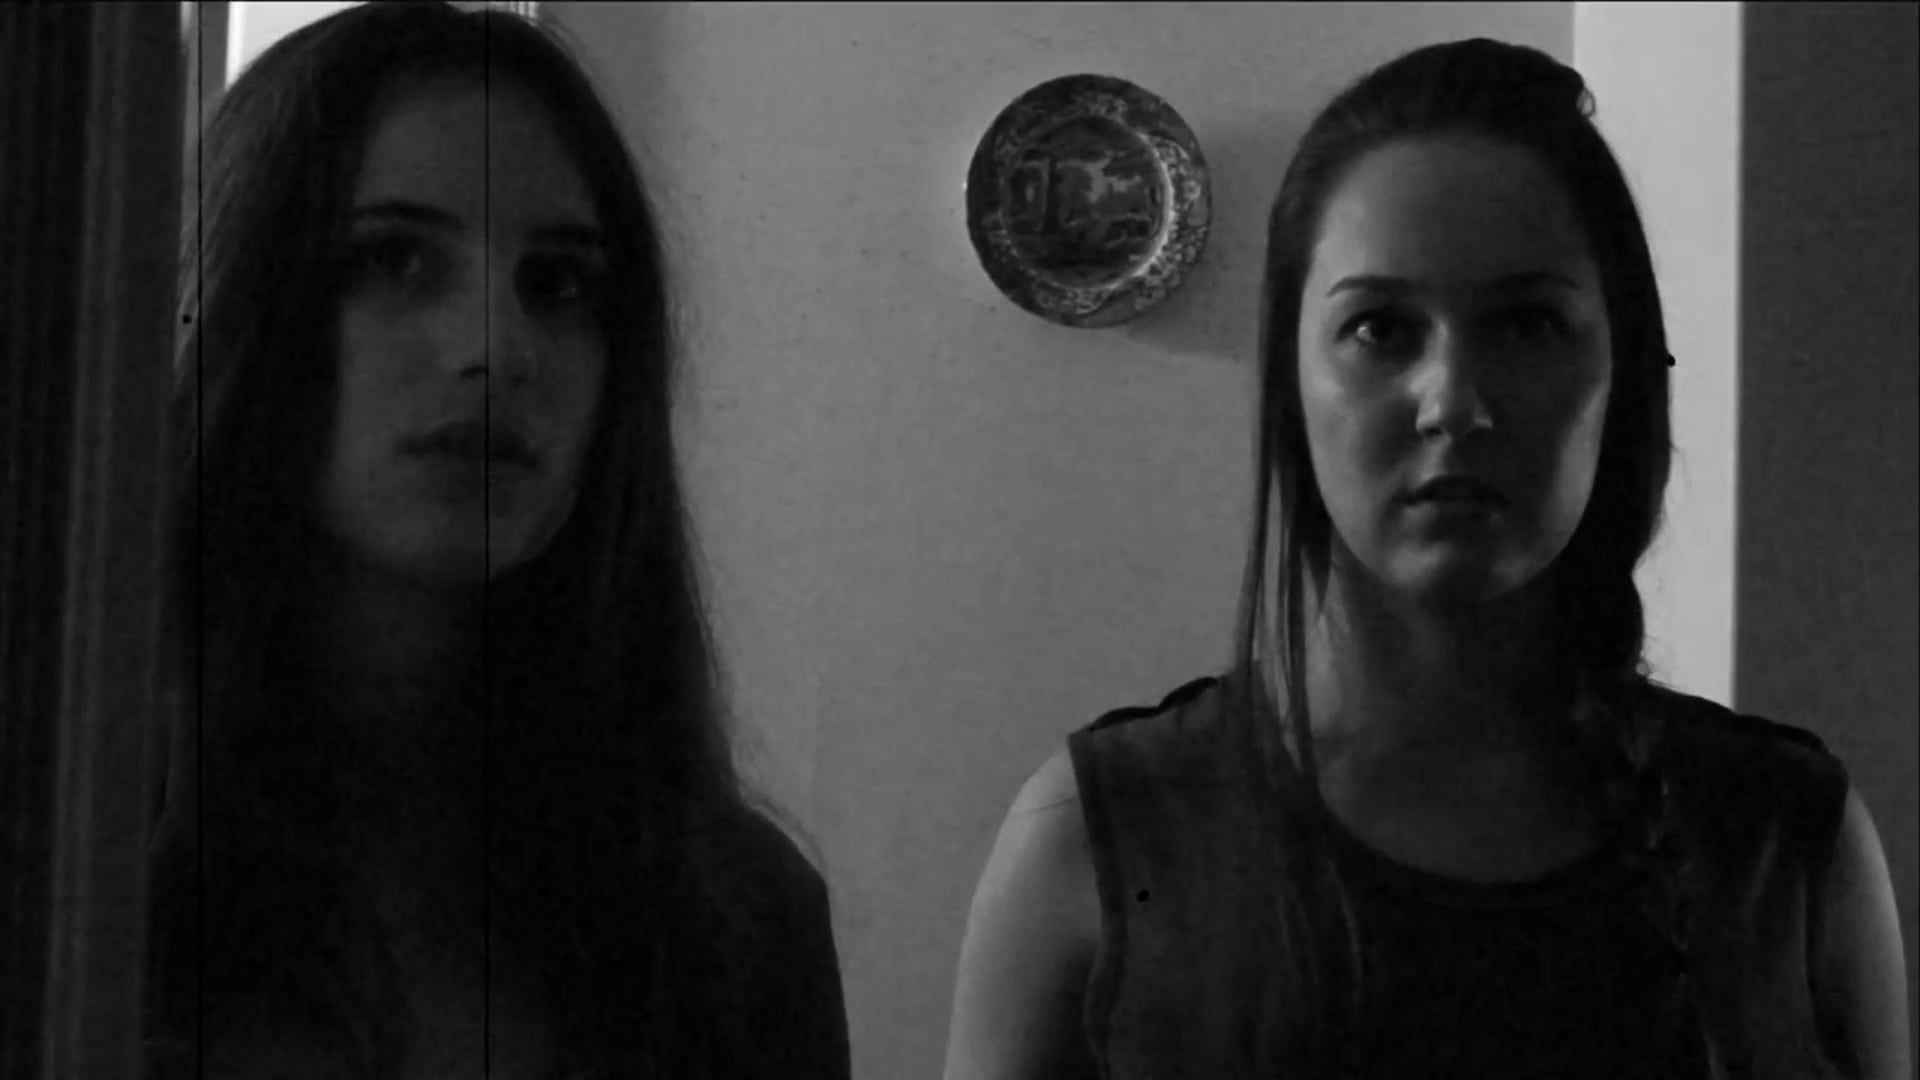 The New Tenant (Short Film)